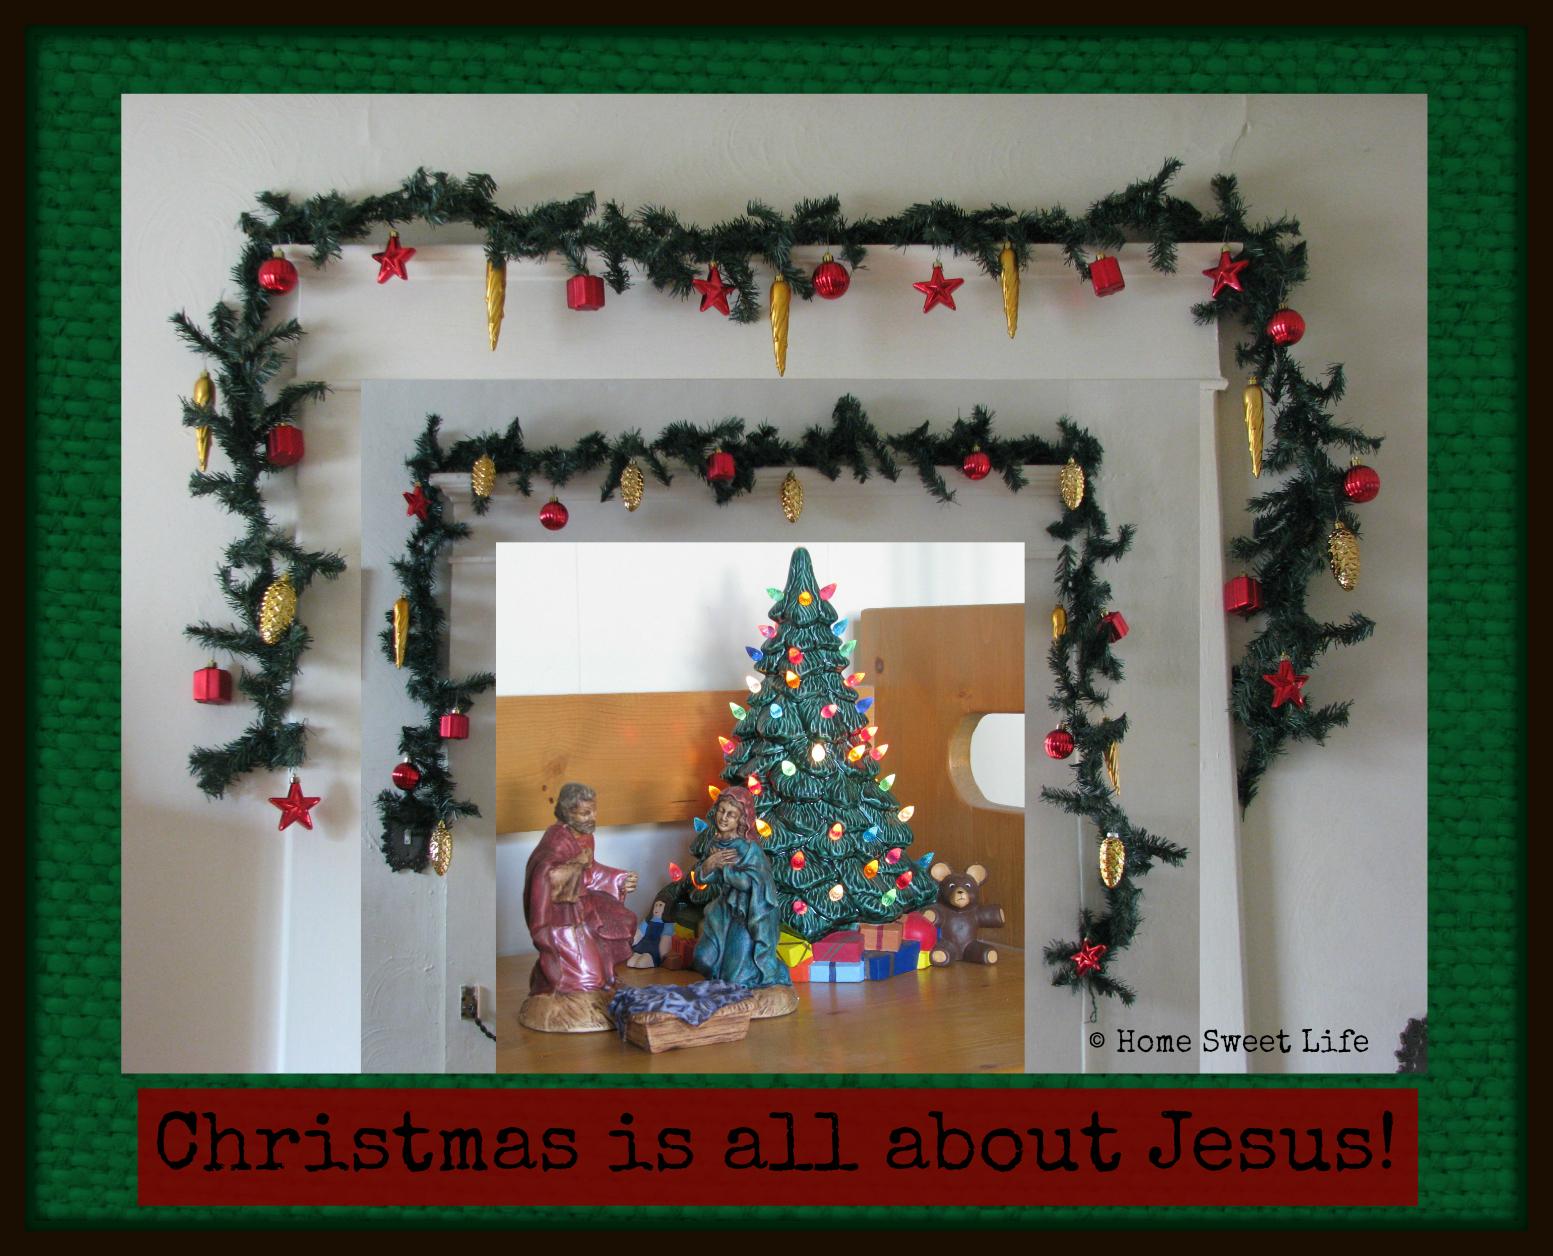 Christmas is abut Jesus